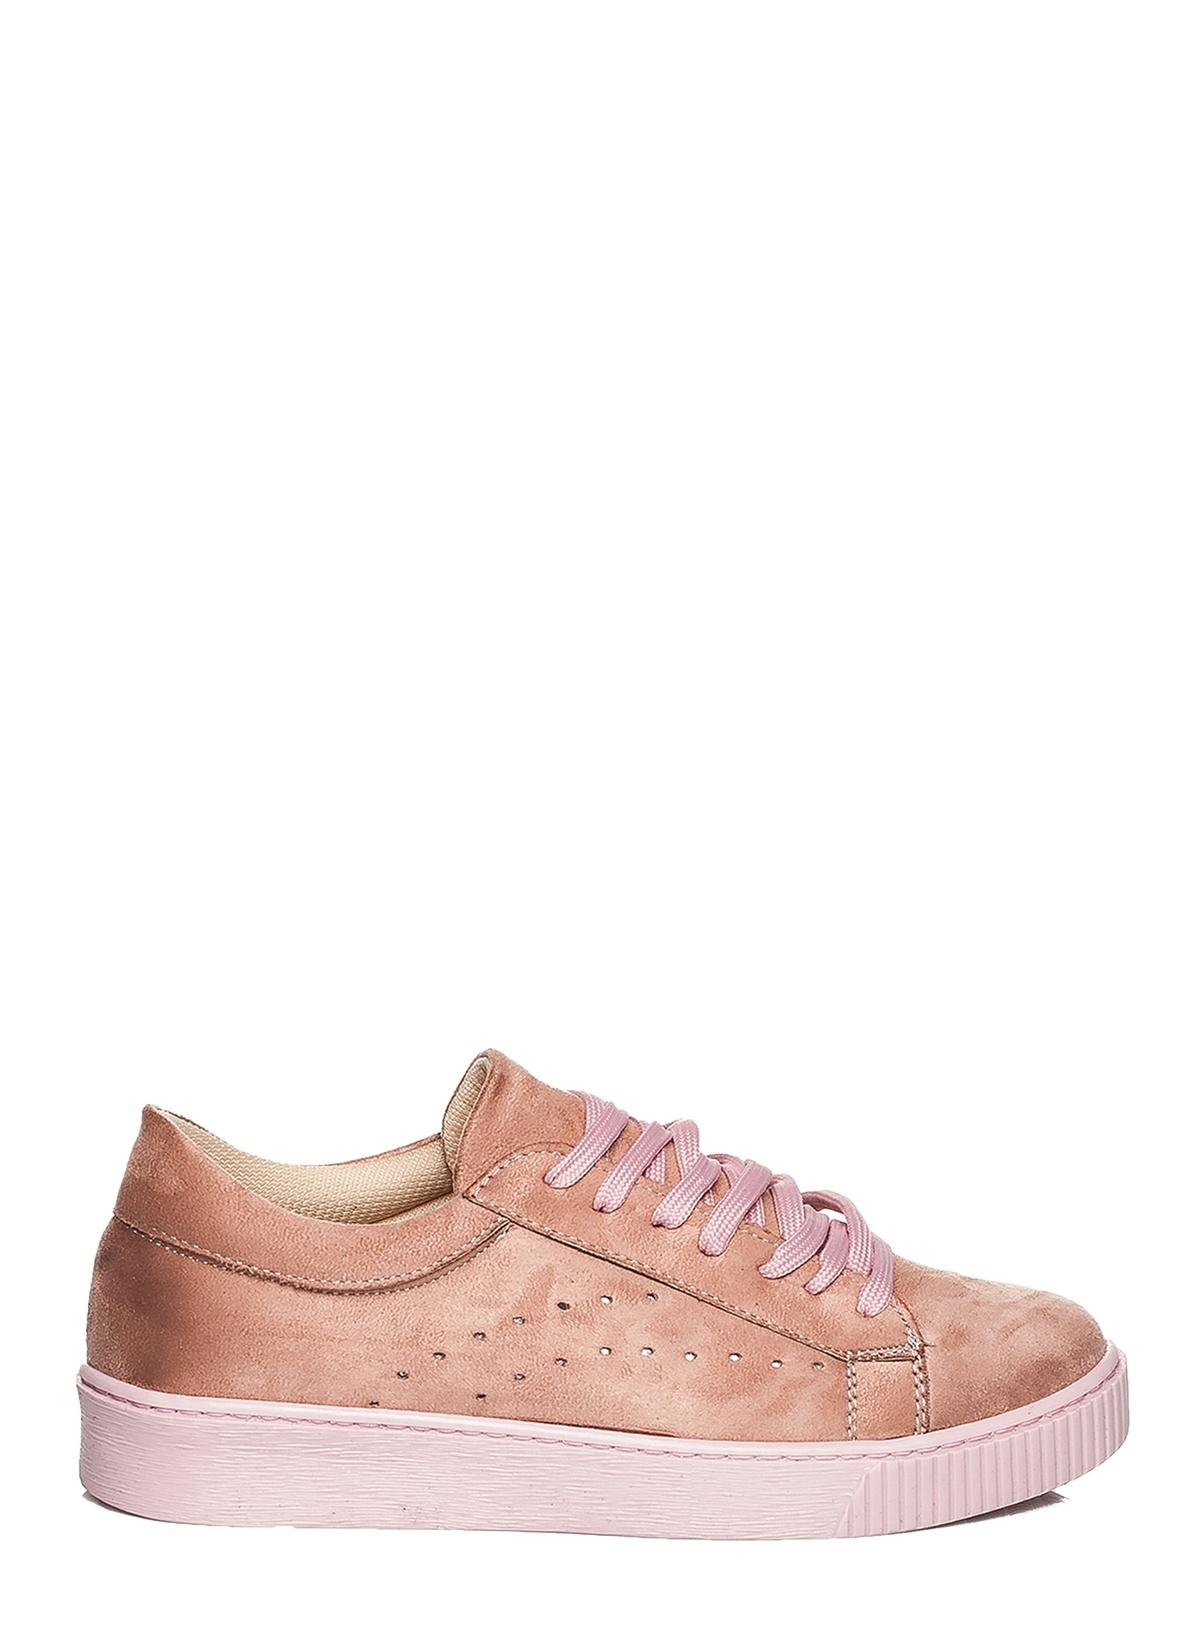 Efem Sneakers 19ymd7010104 Spor Ayakkabı – 129.9 TL